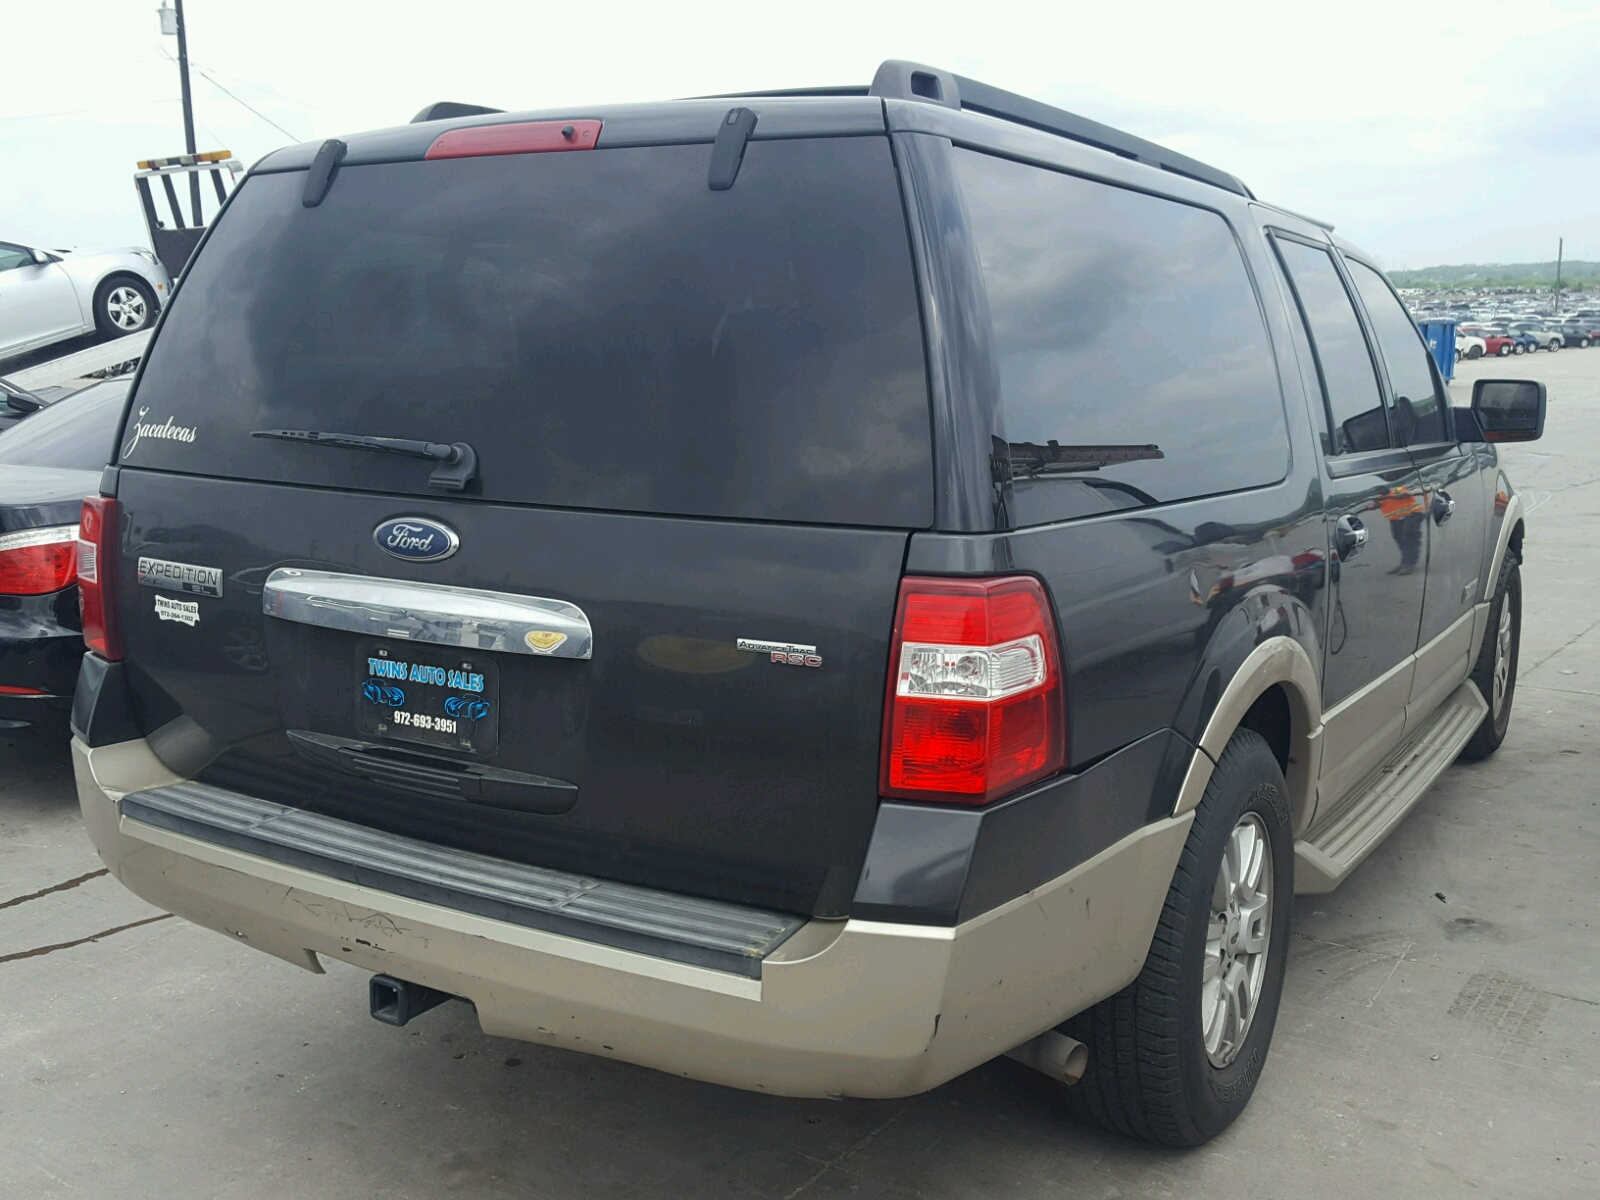 2007 Ford Expedition Front End Damage 1FMFK LA Sold